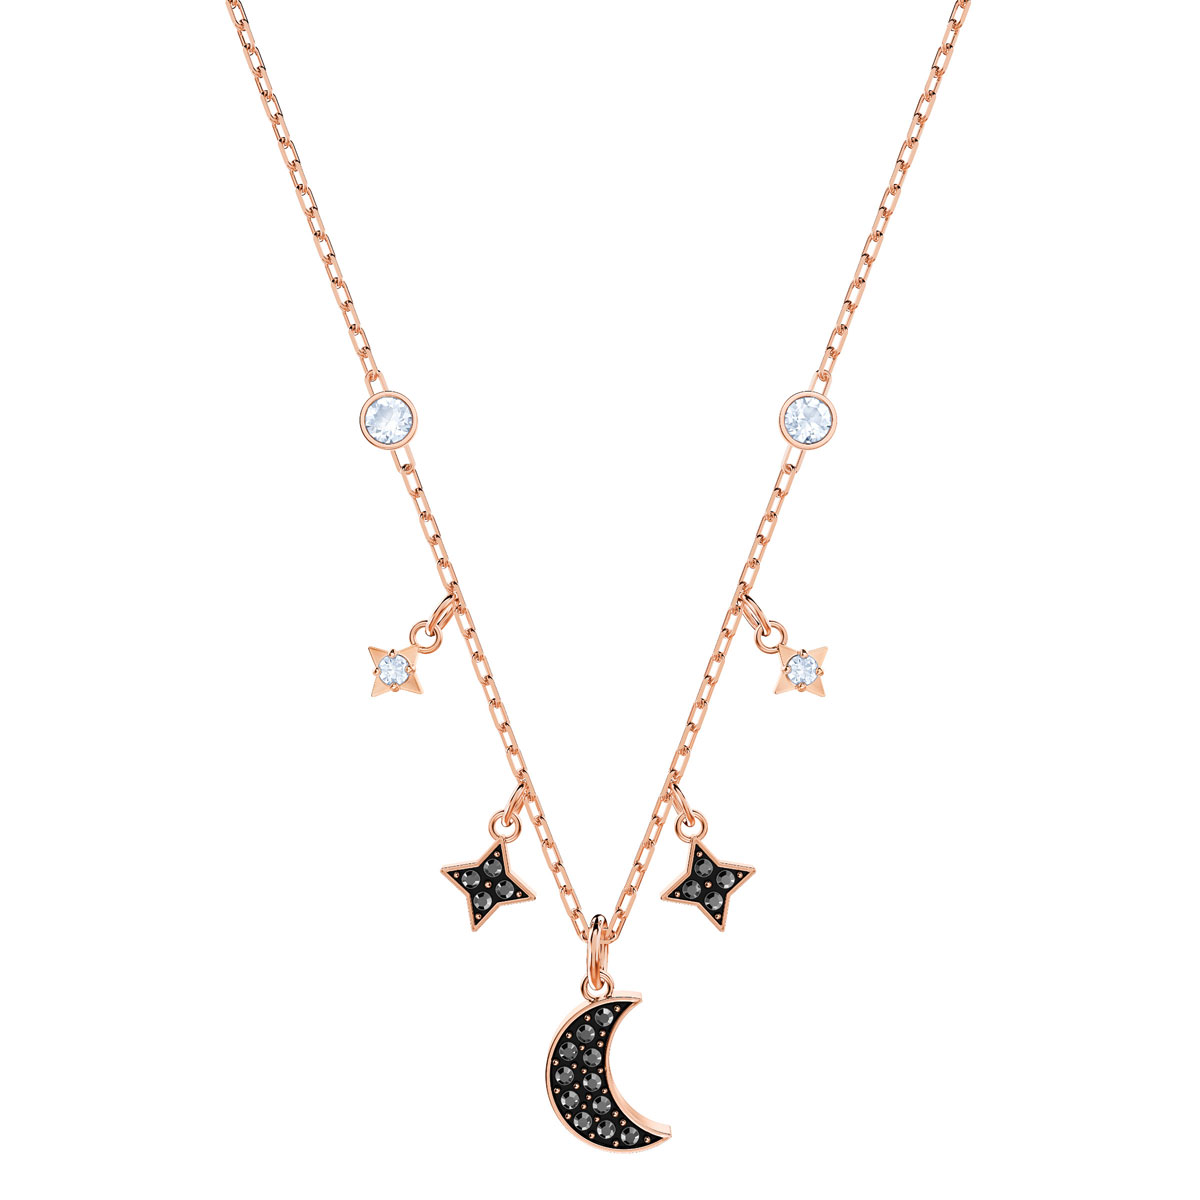 Swarovski Symbolic Moon Necklace, Black, Rose Gold